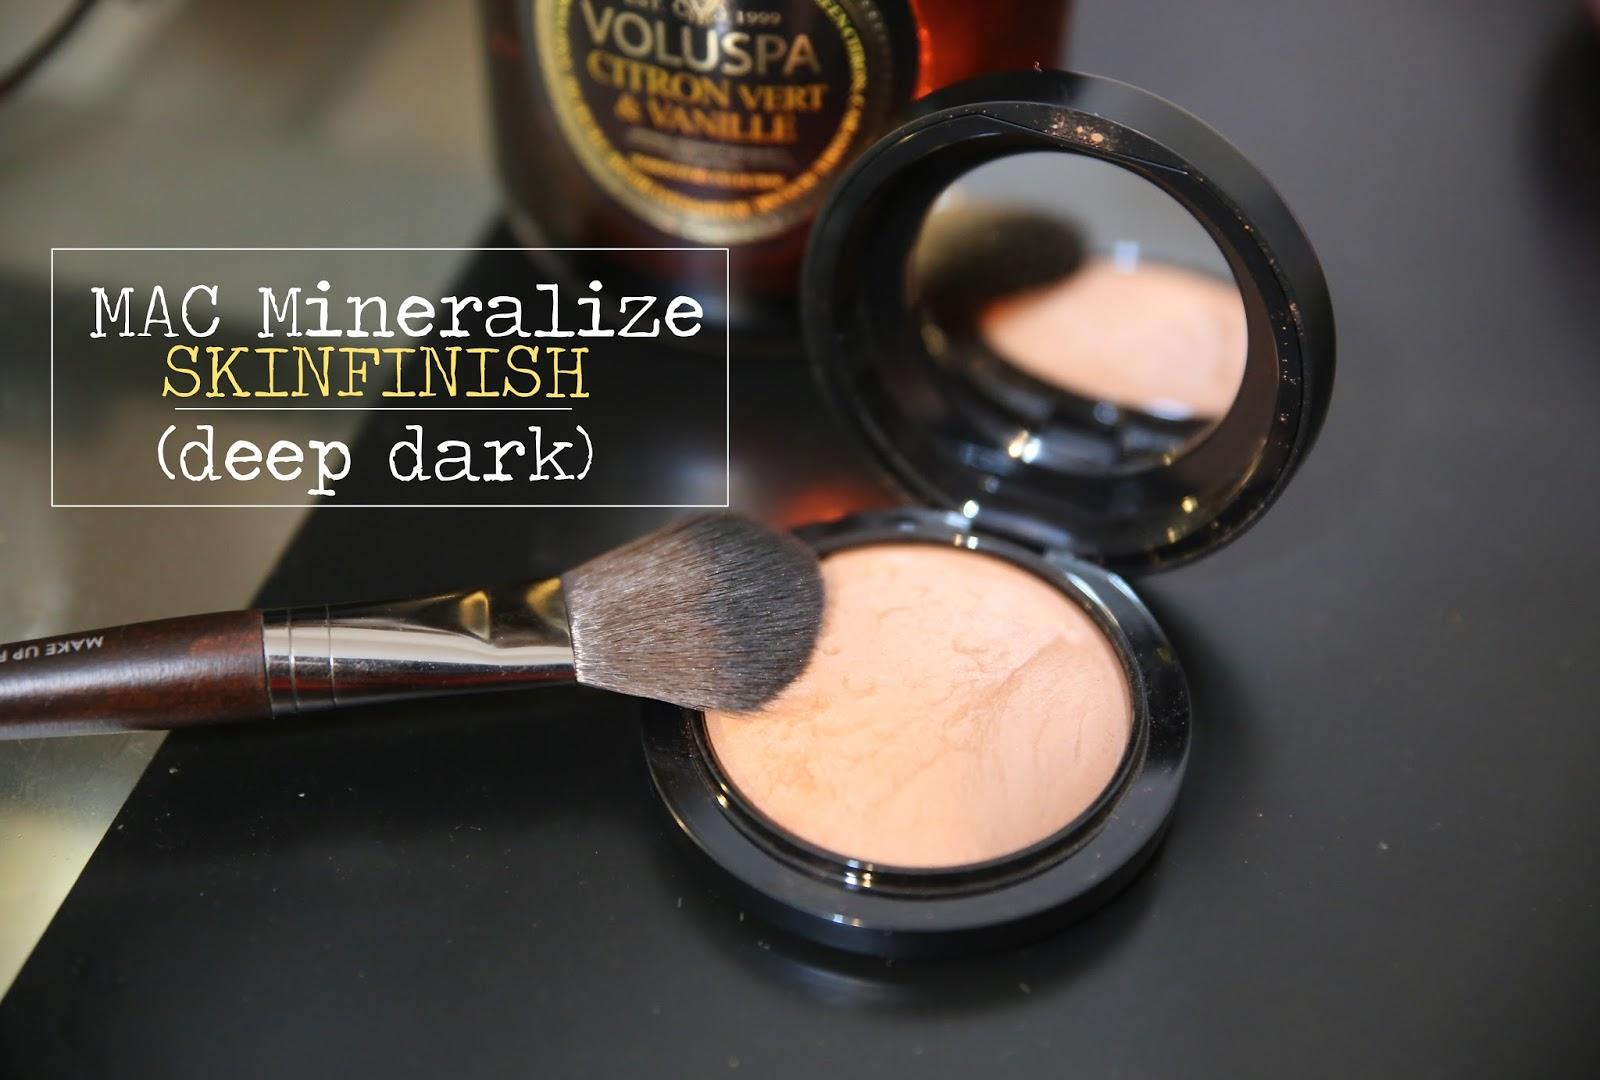 Mac Mineralize Skinfinish Deep Dark